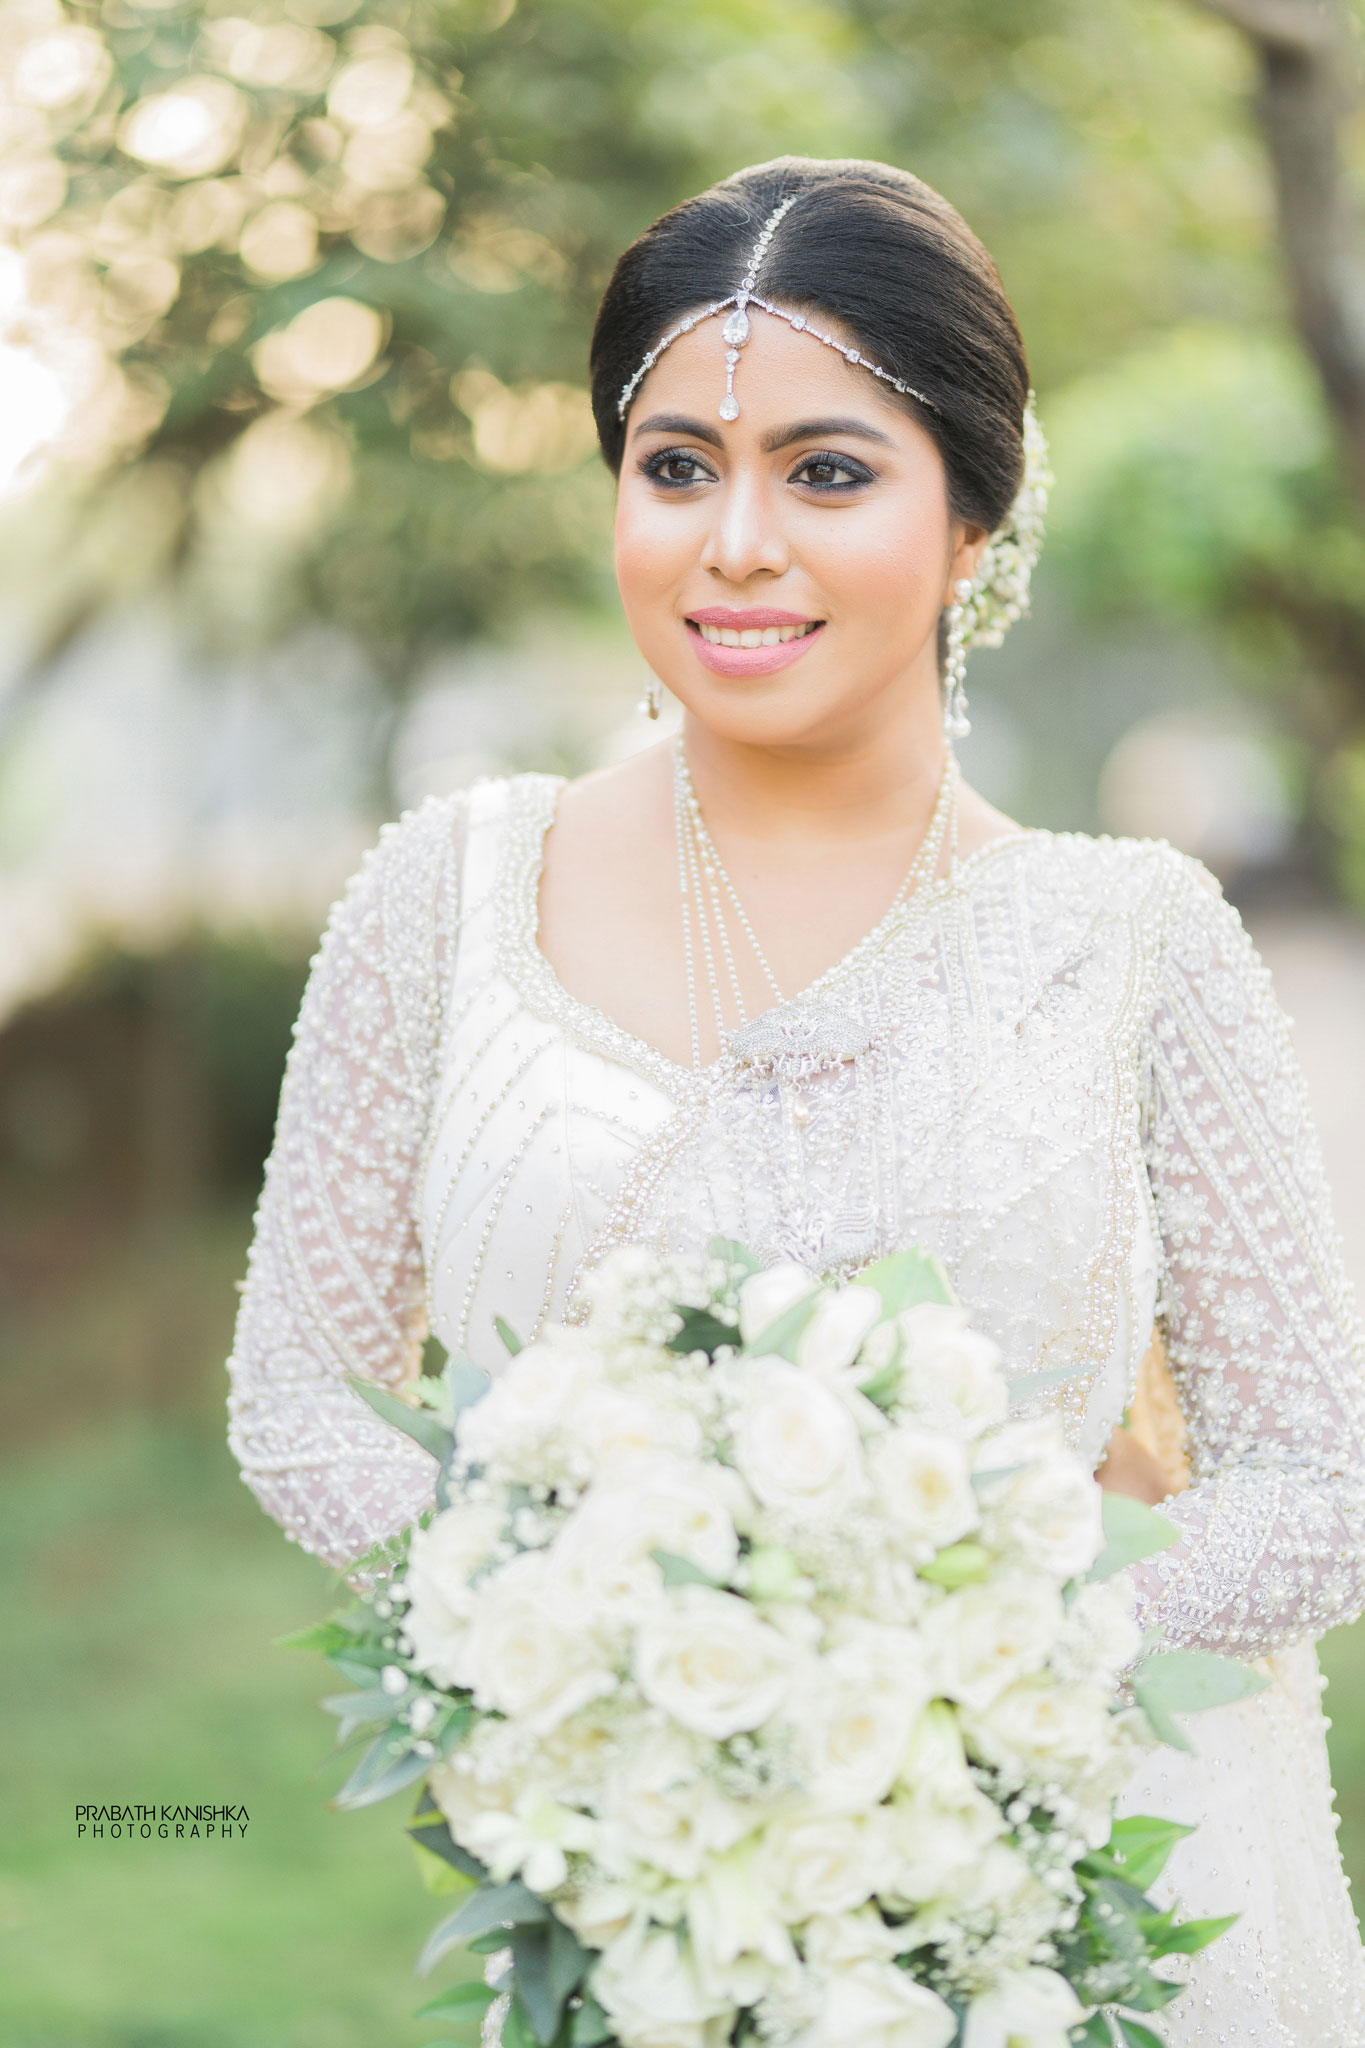 Navodha & Anuja - Prabath Kanishka Wedding Photography